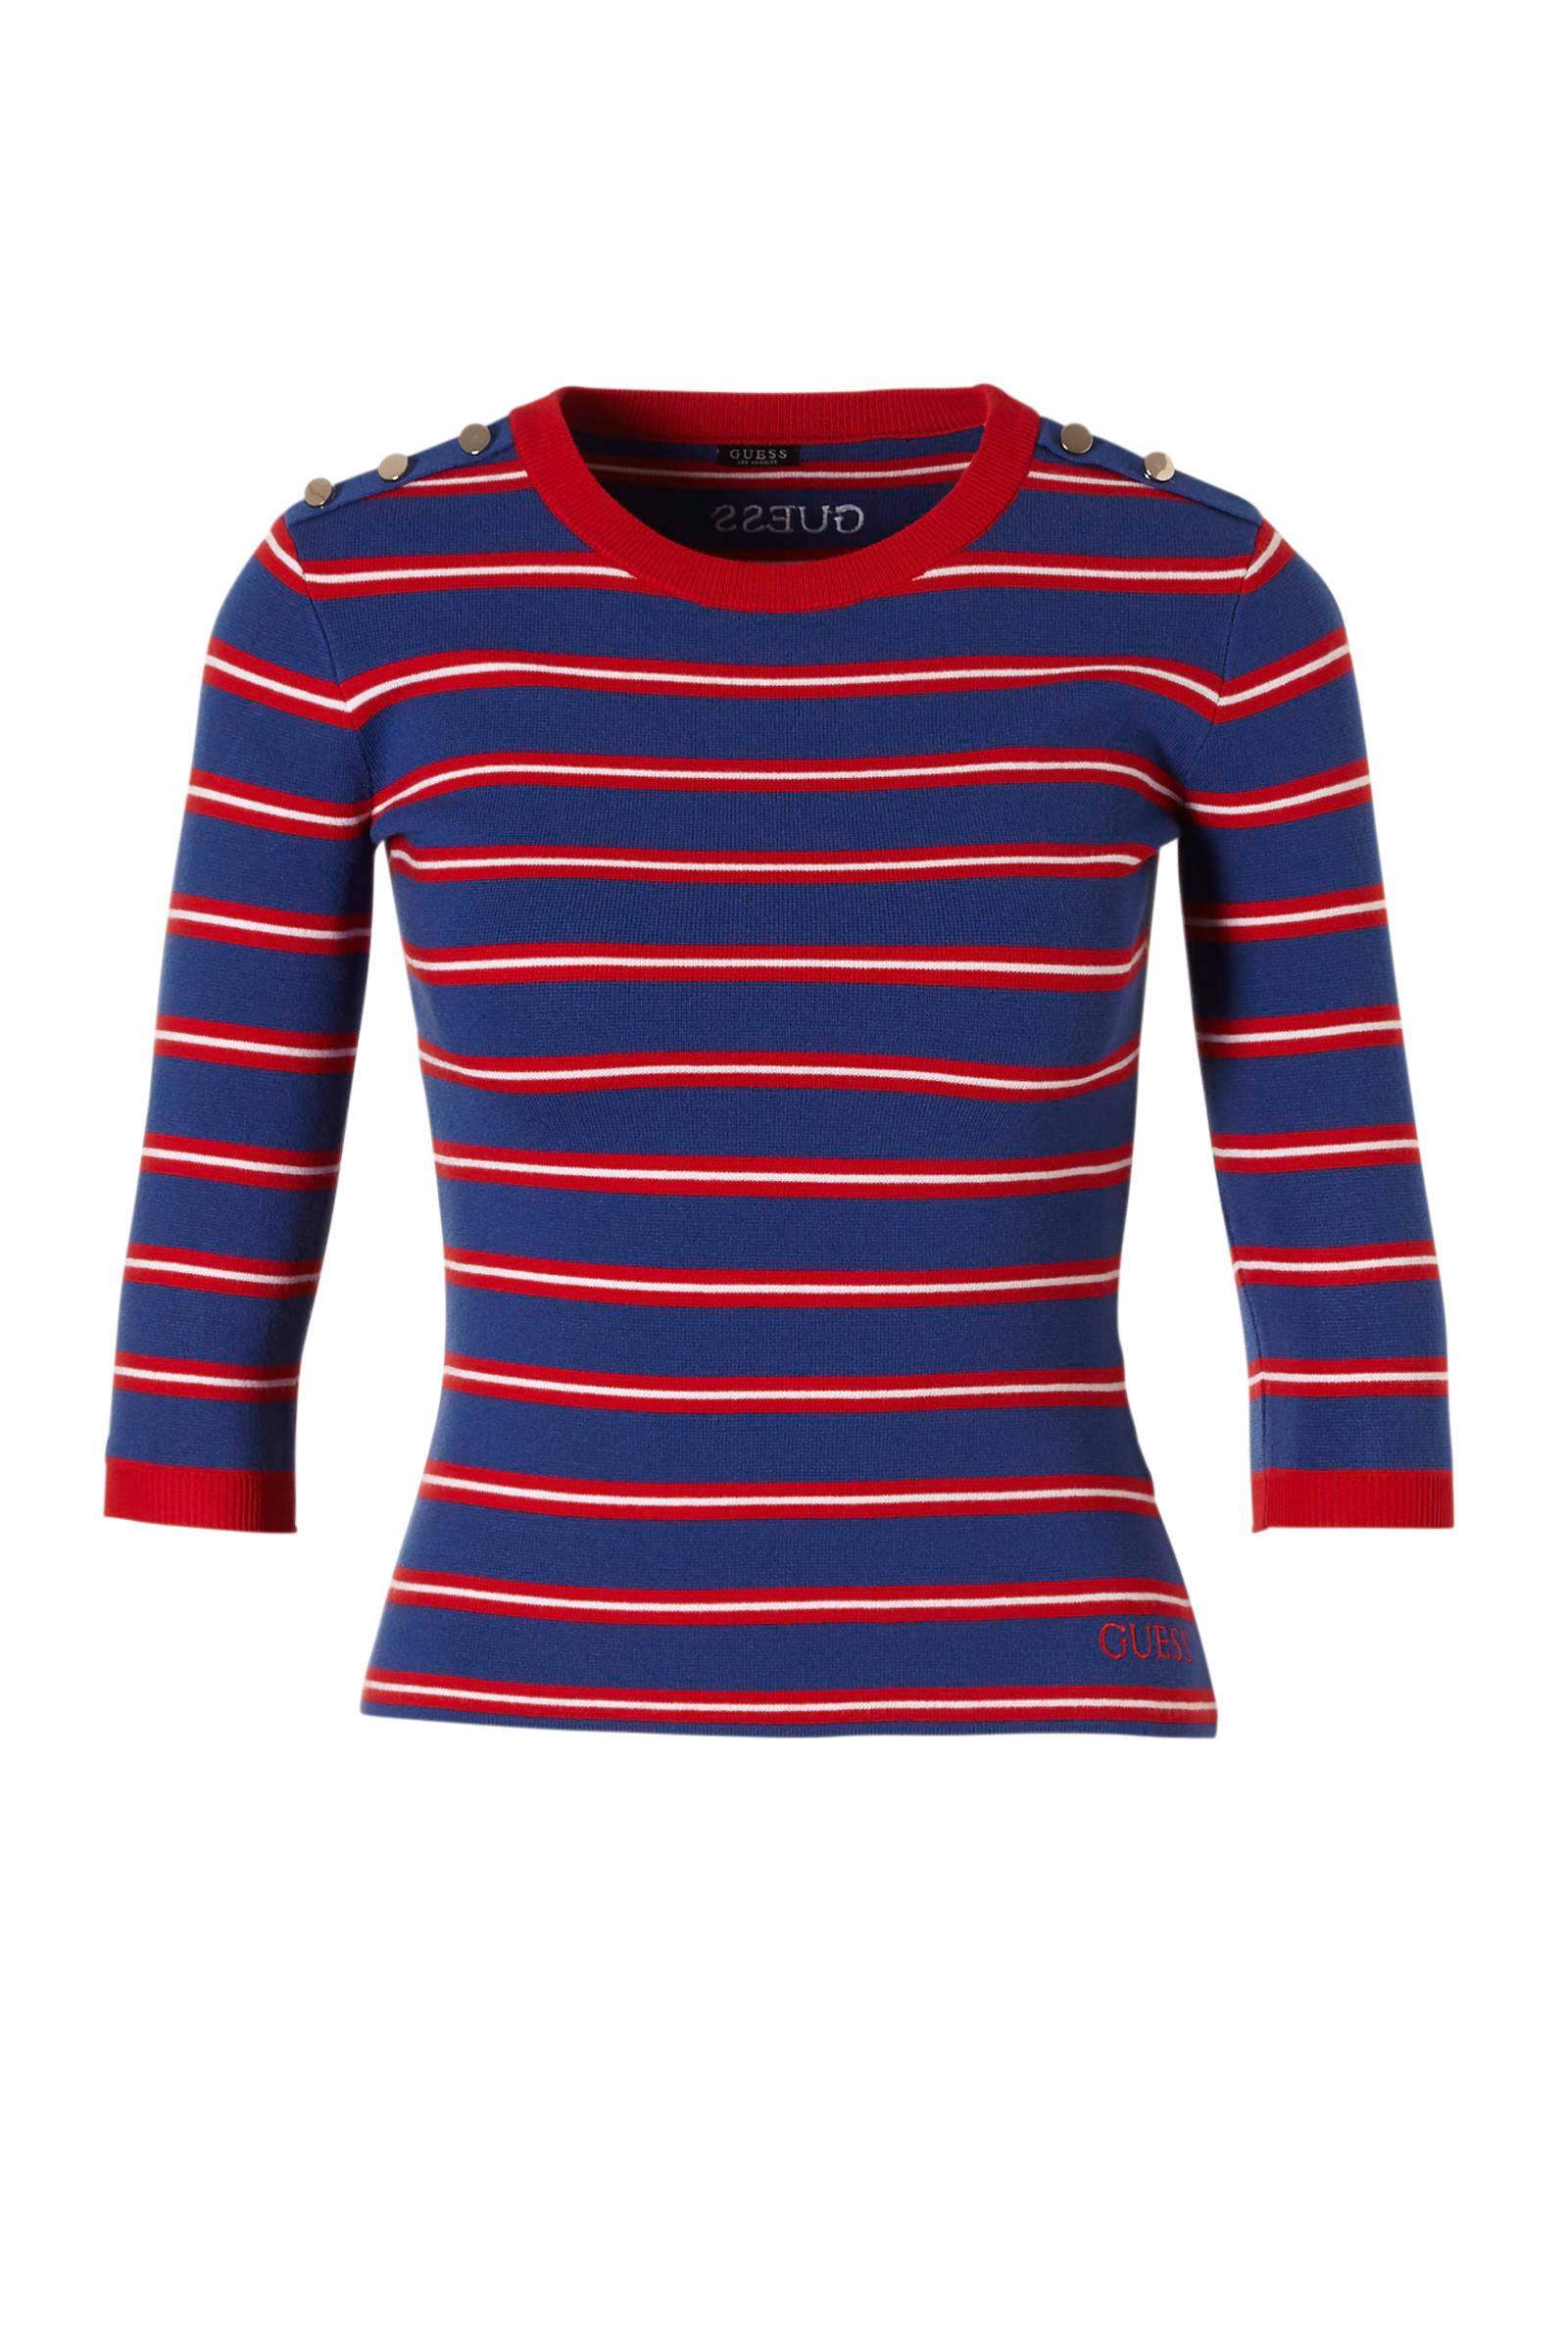 GUESS gestreept T shirt Adele blauwroodwit | wehkamp